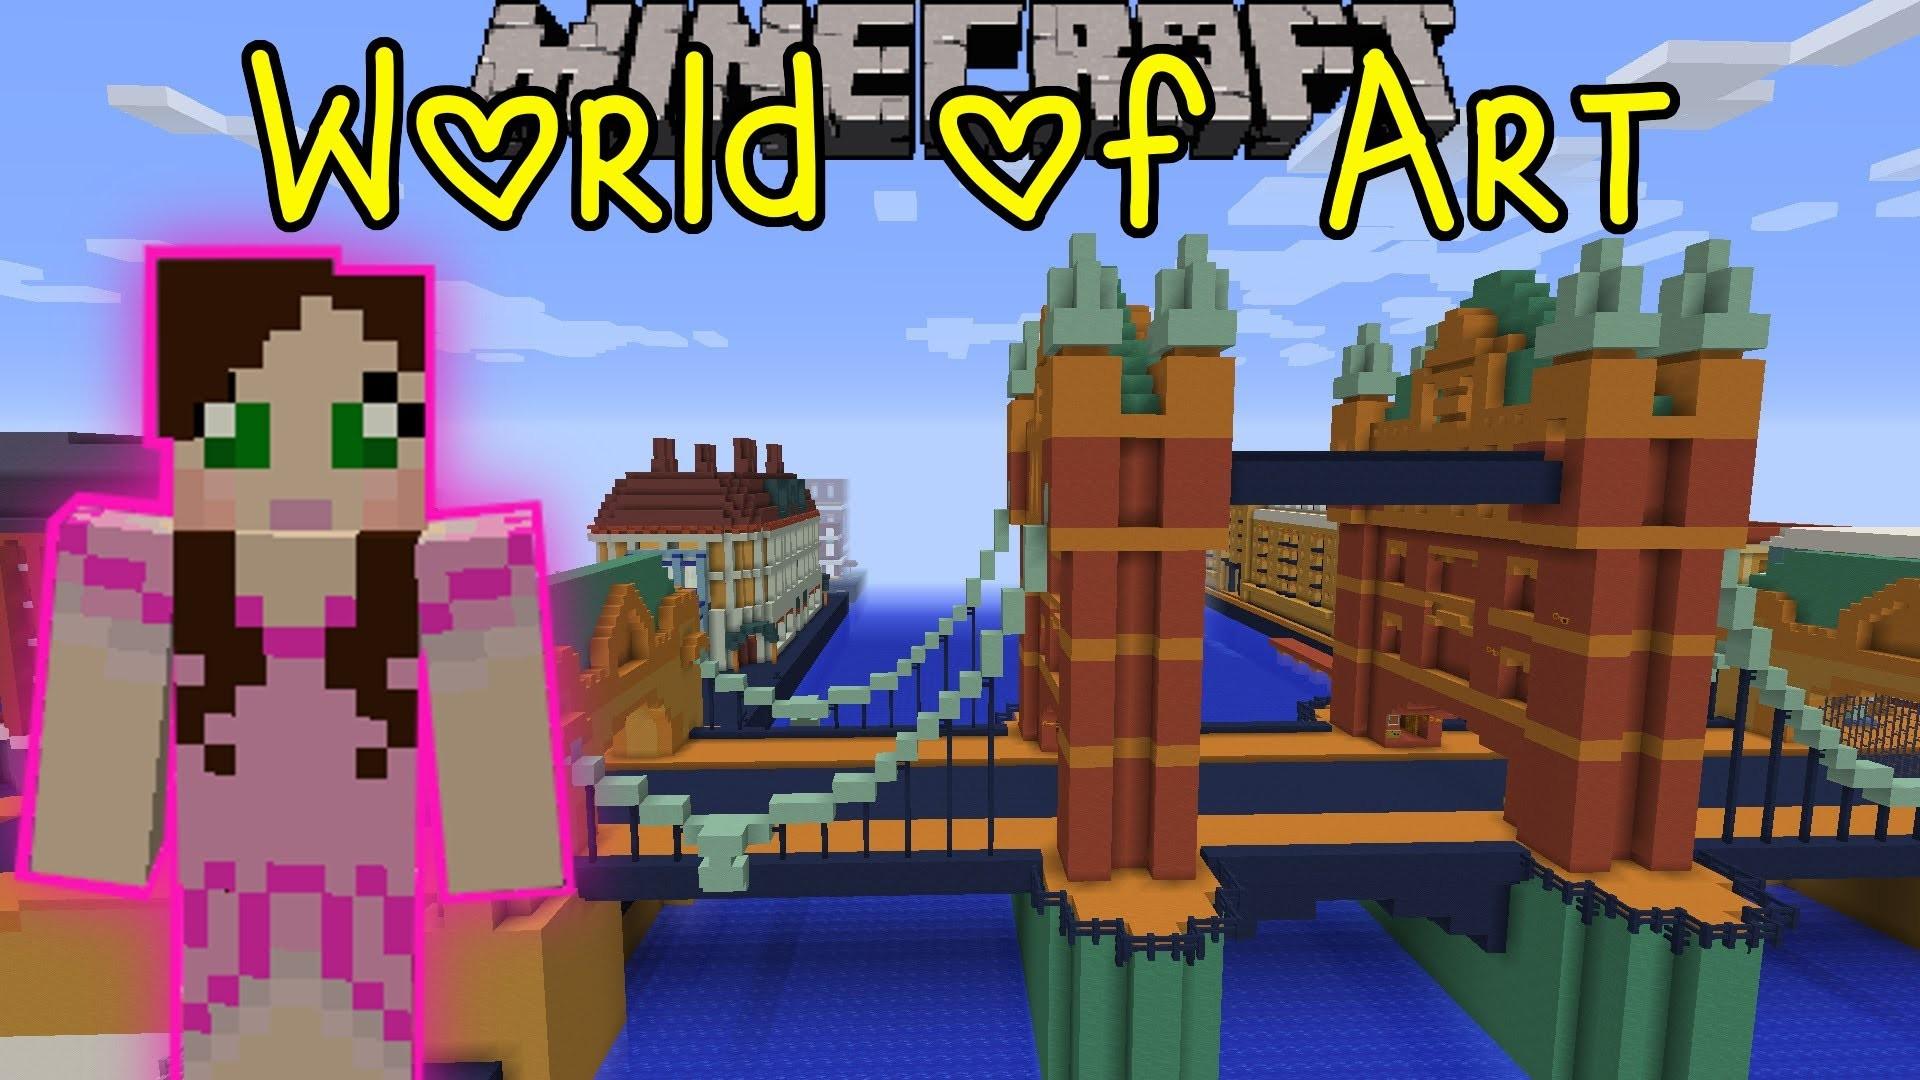 Pat And Jen Minecraft: World Of Art (Custom Map) Part 3 GamingWithJen